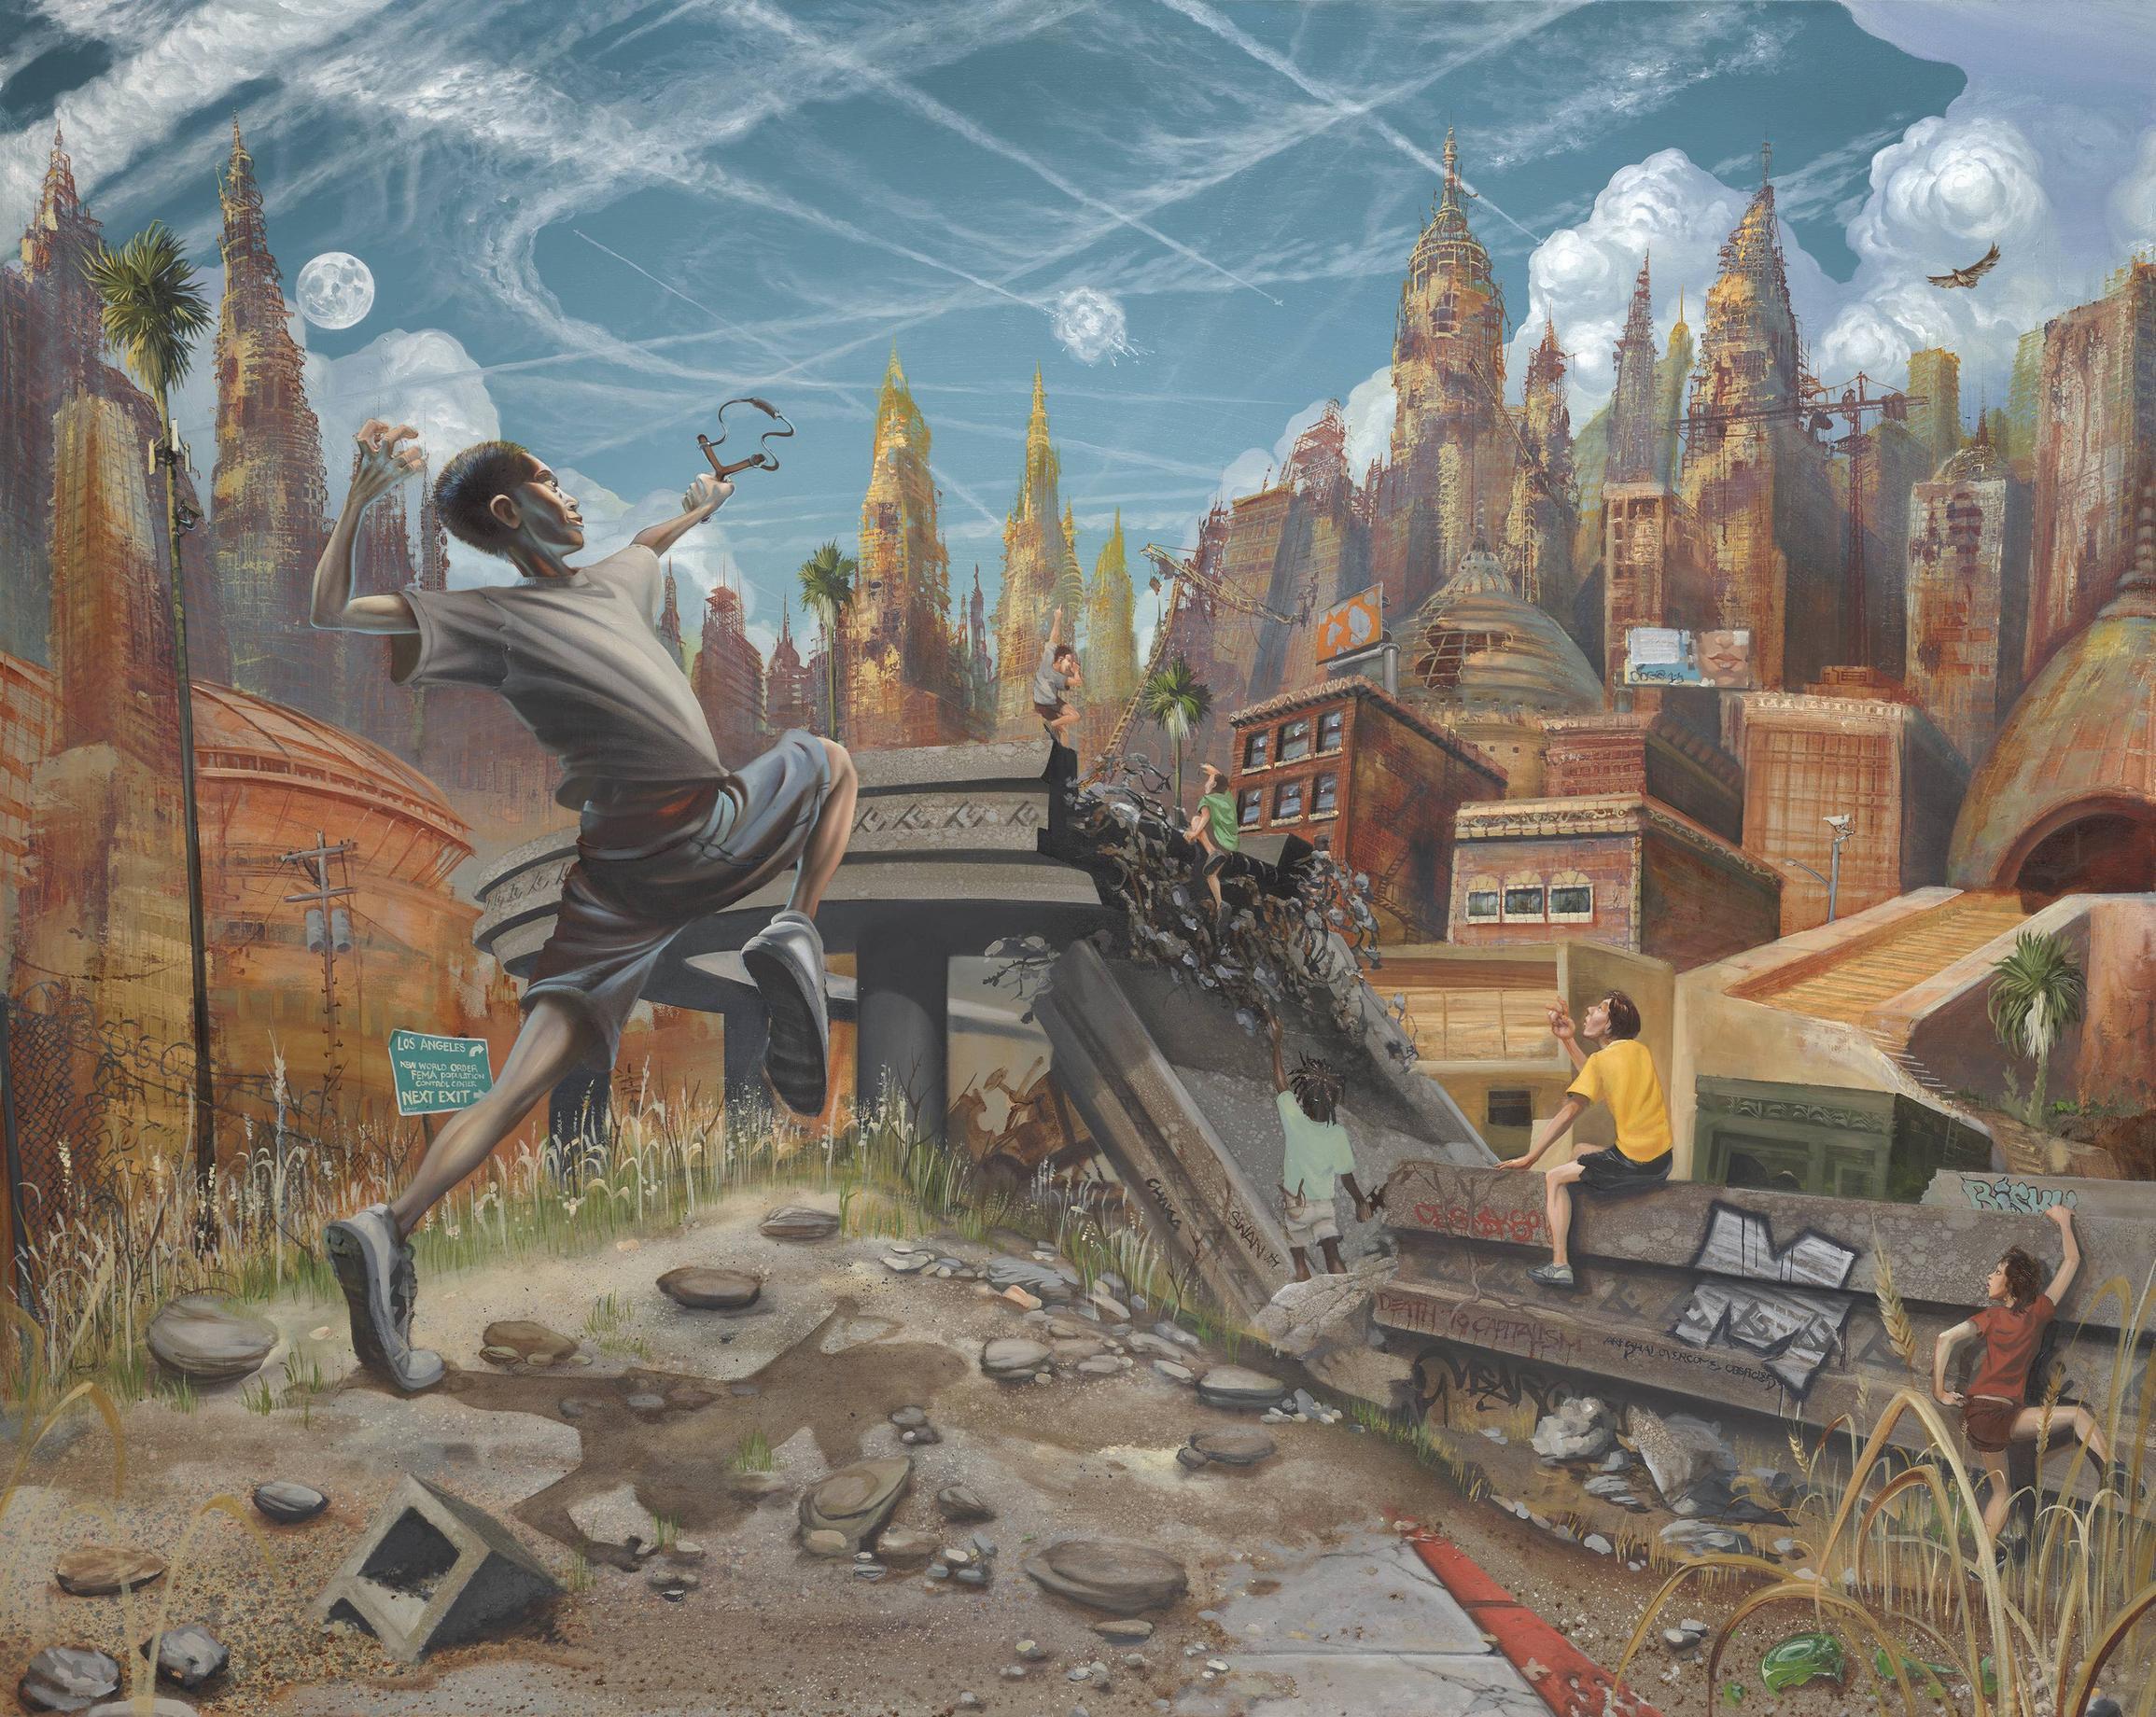 Freeport - David & Goliath 7/100